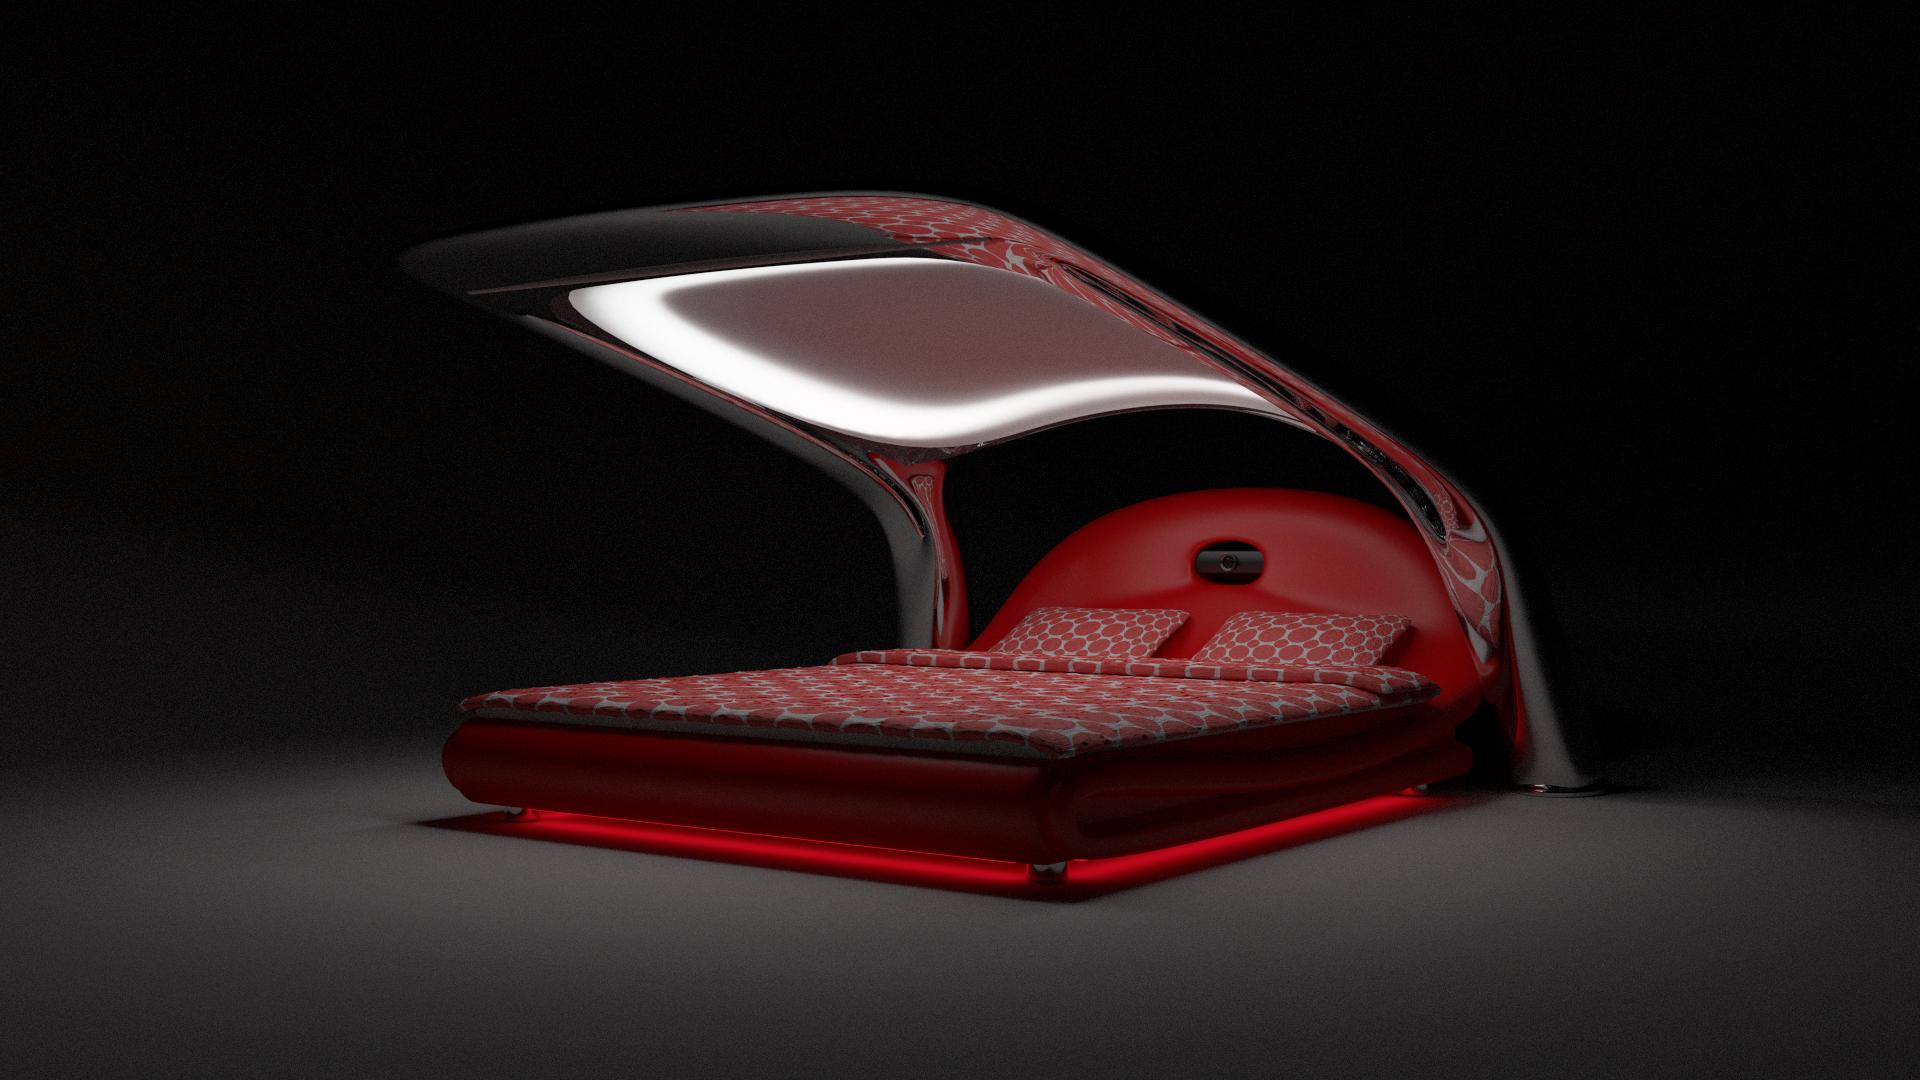 futuristic bed concept2 by hlupekkk on deviantart 26 futuristic bedroom designs decoholic